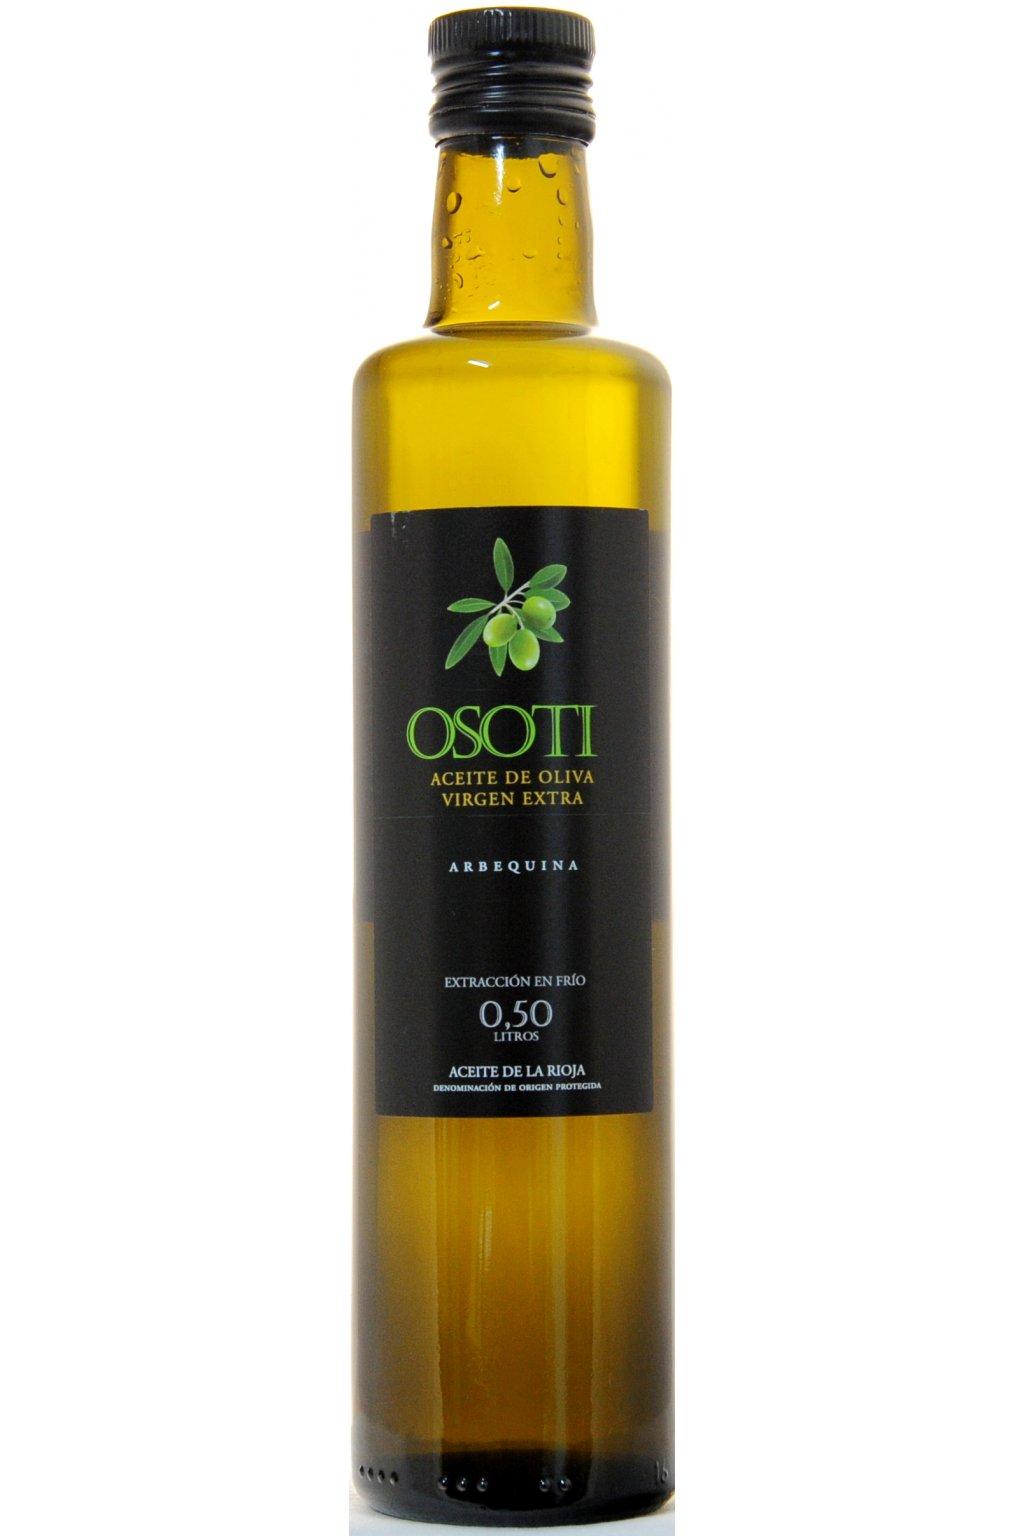 OSOTI Olive Oil F